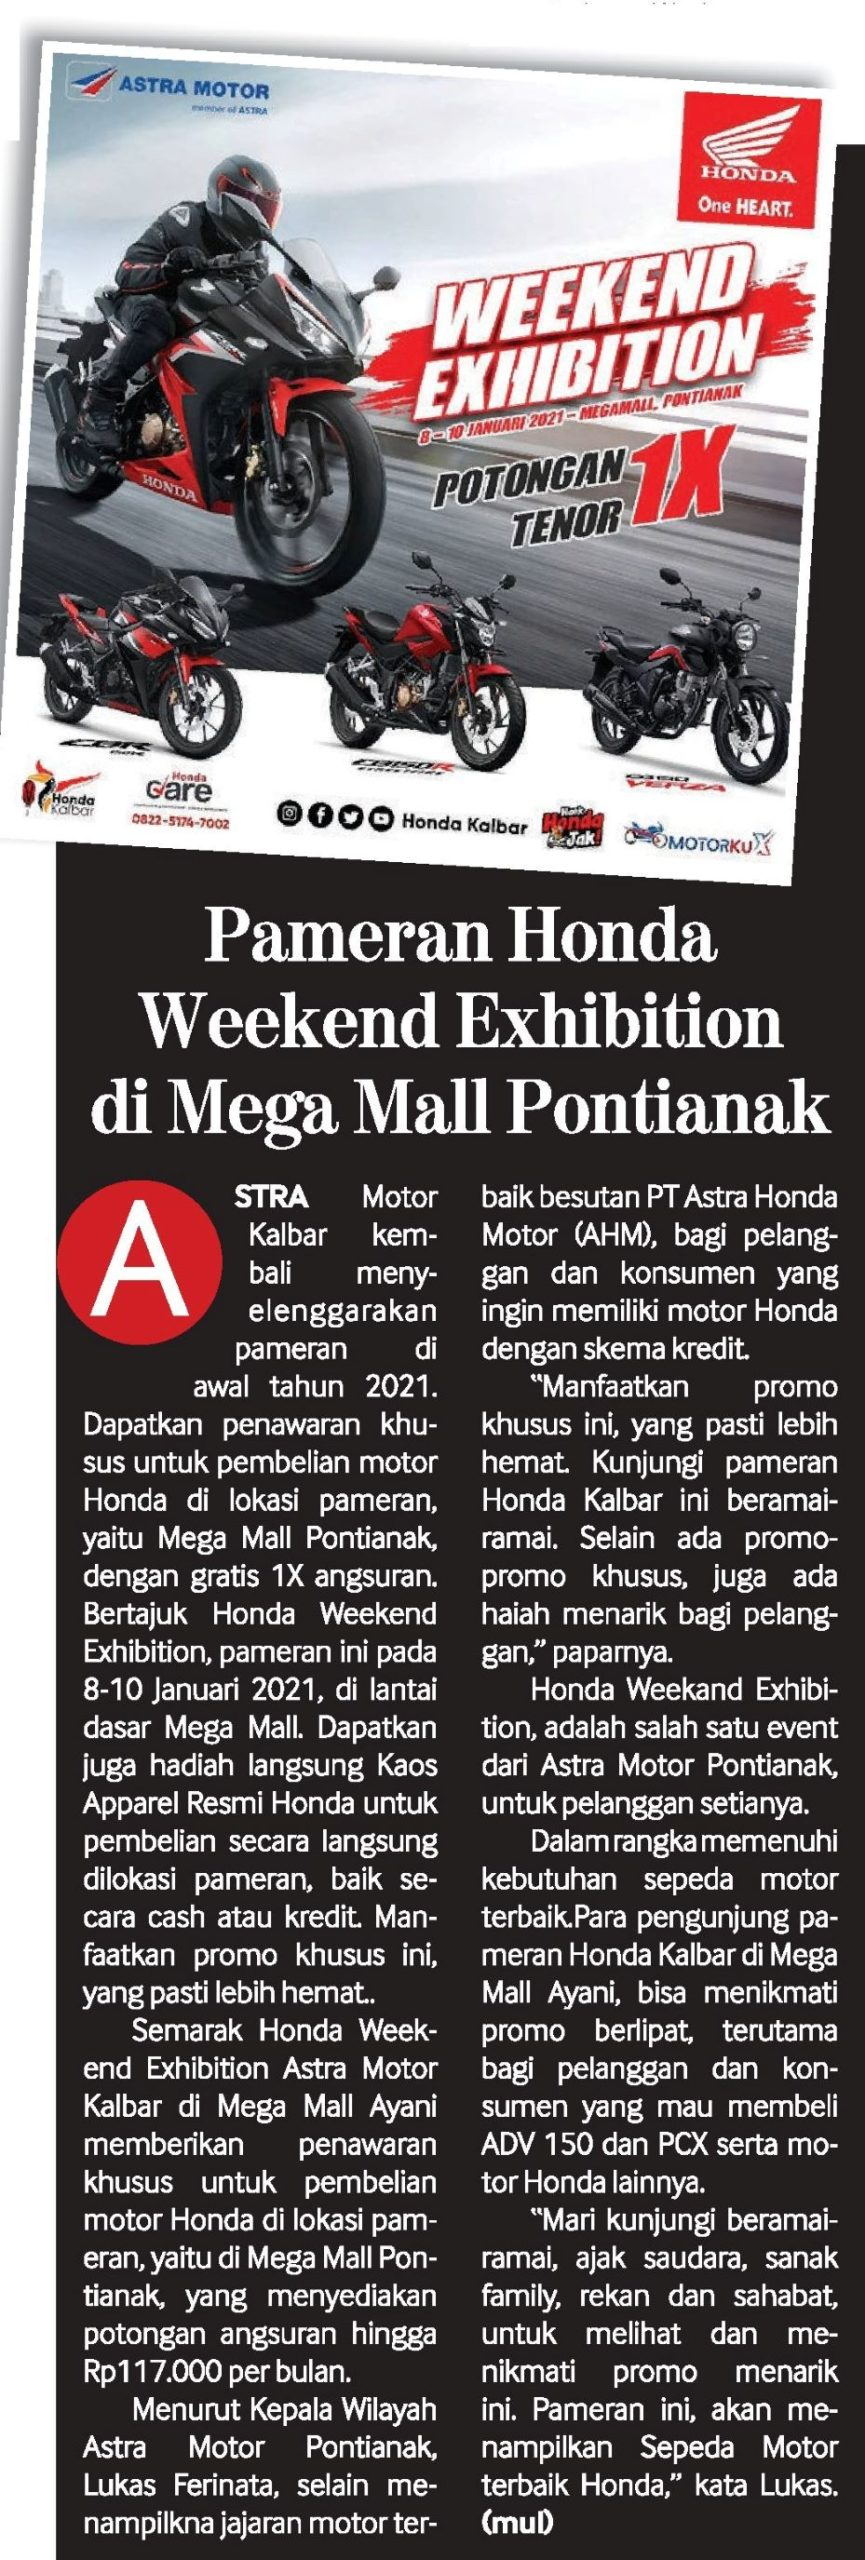 H 9 Jan - Pameran honda Weekend Exhibition Di Megamall Pontianak